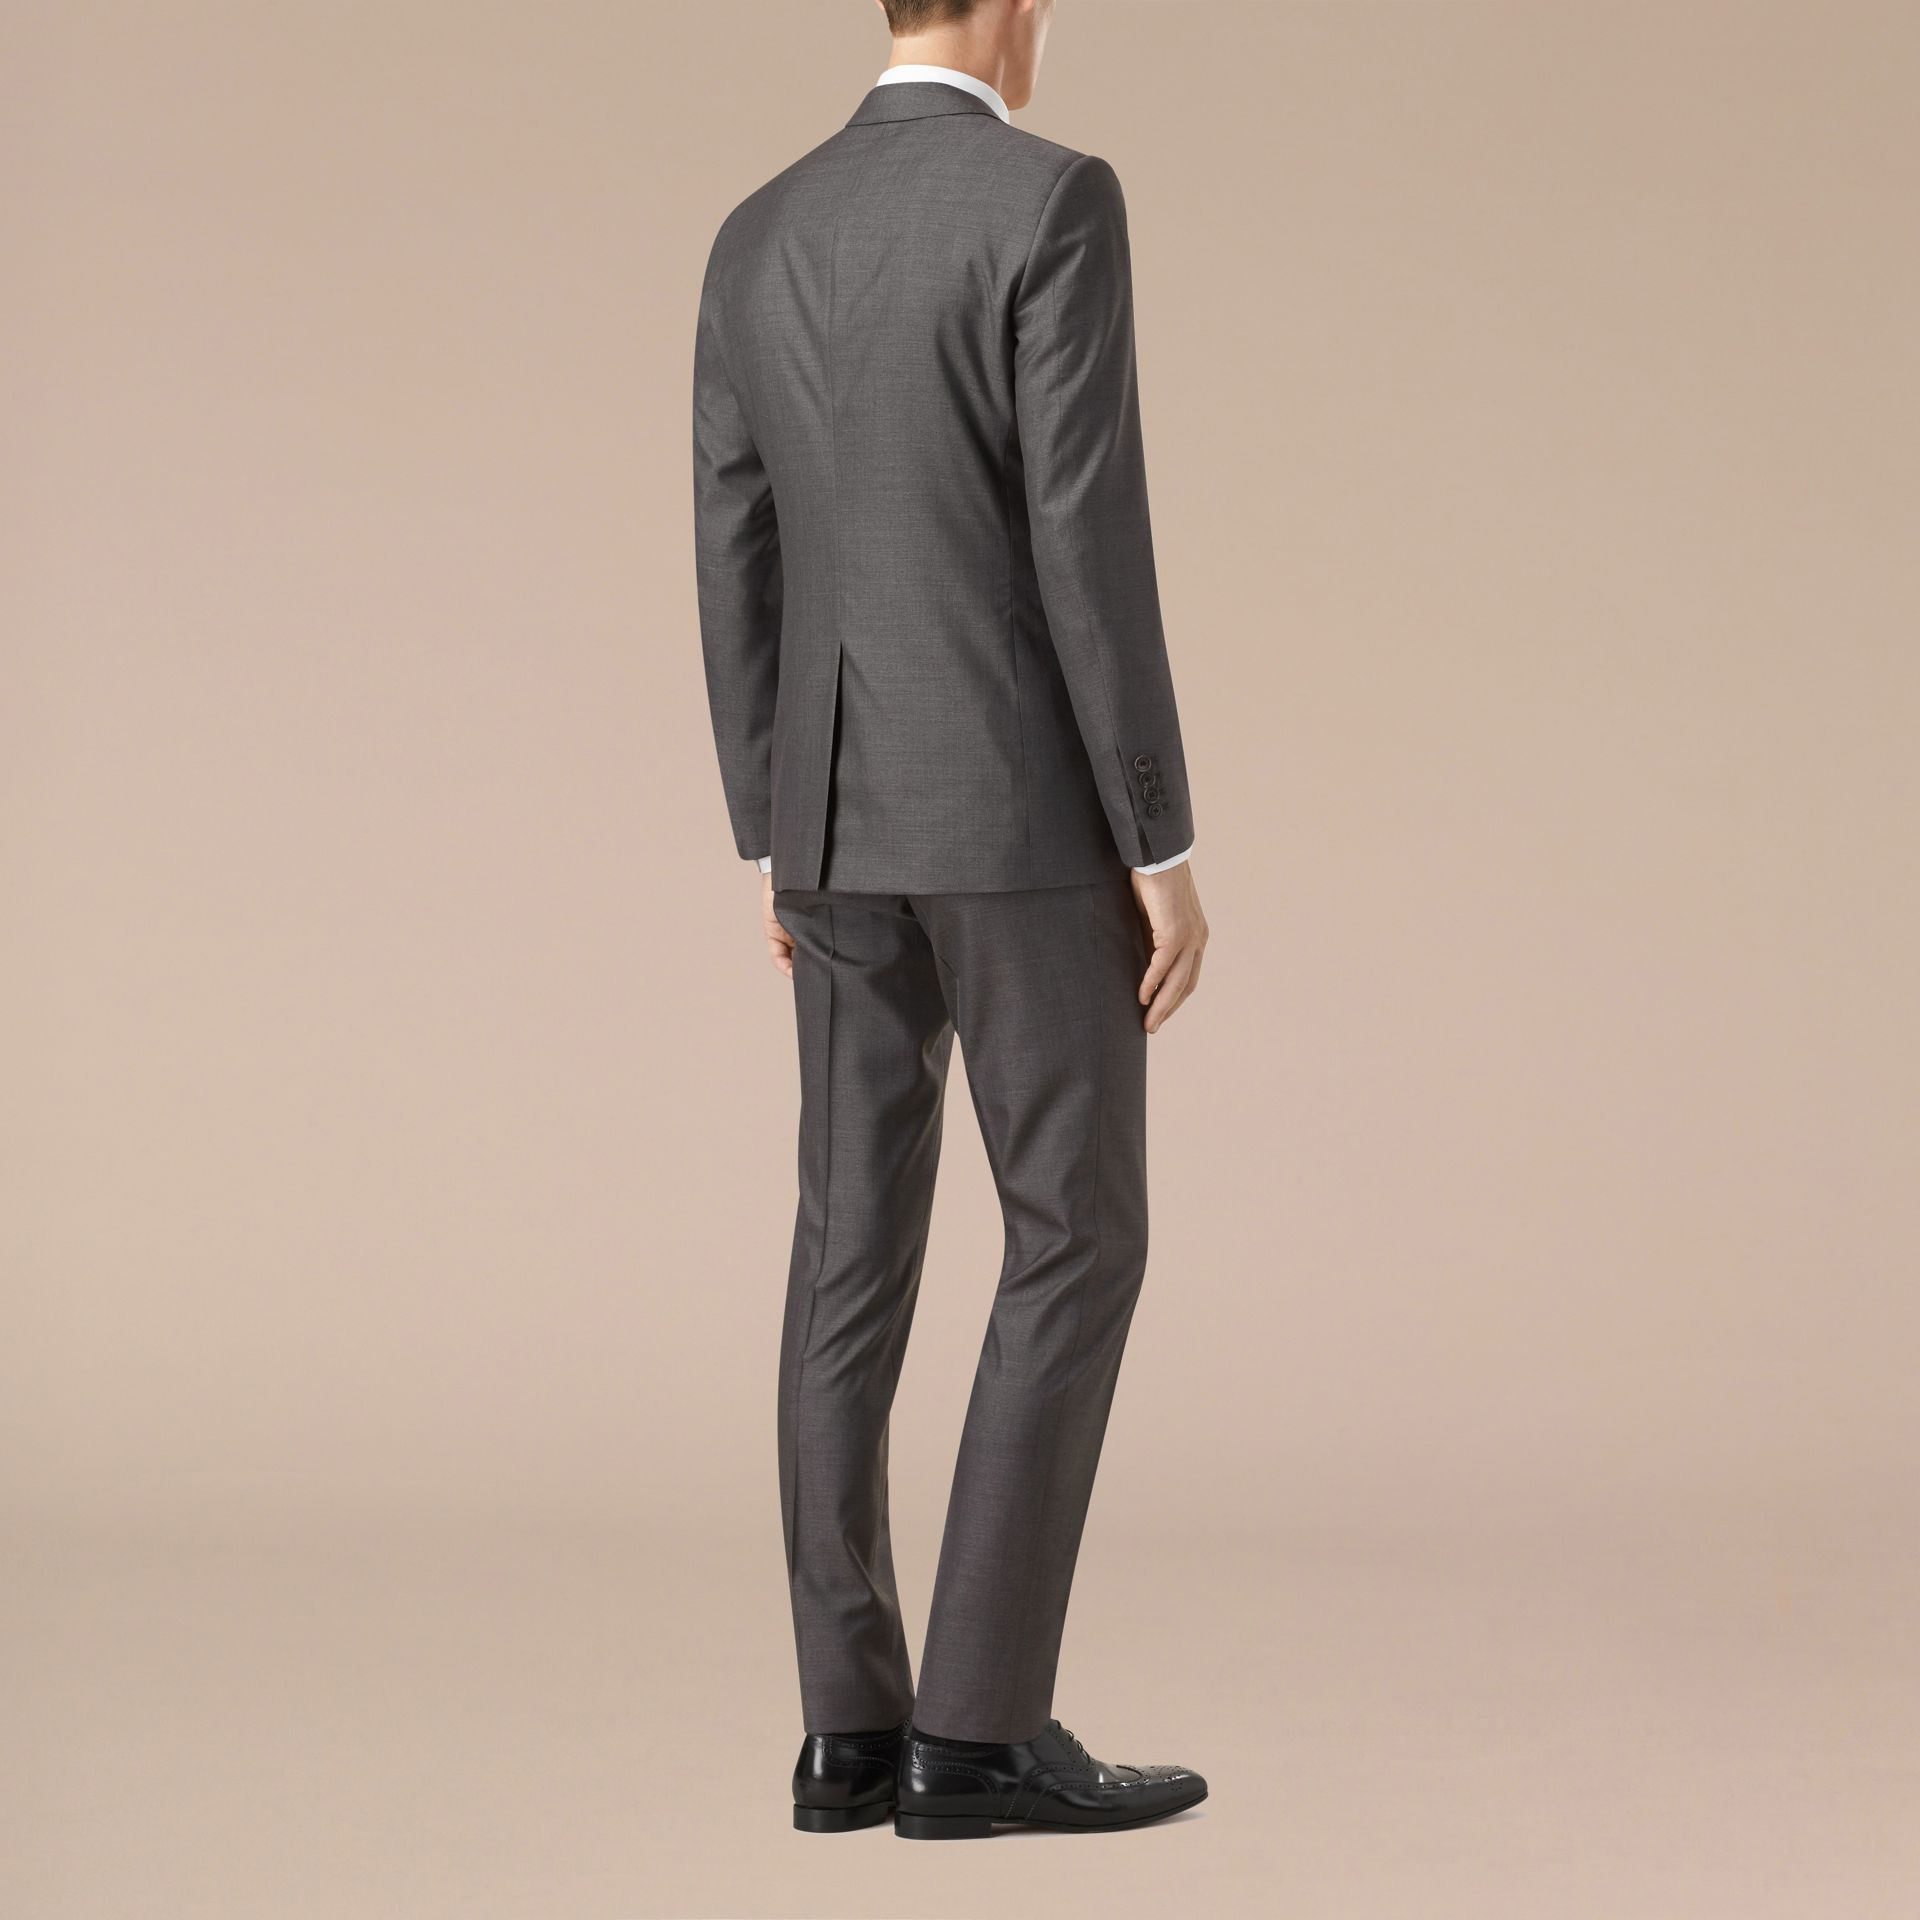 Dunkelgrau meliert Körperbetonter Anzug aus Wolle und Seide Dunkelgrau Meliert - Galerie-Bild 3